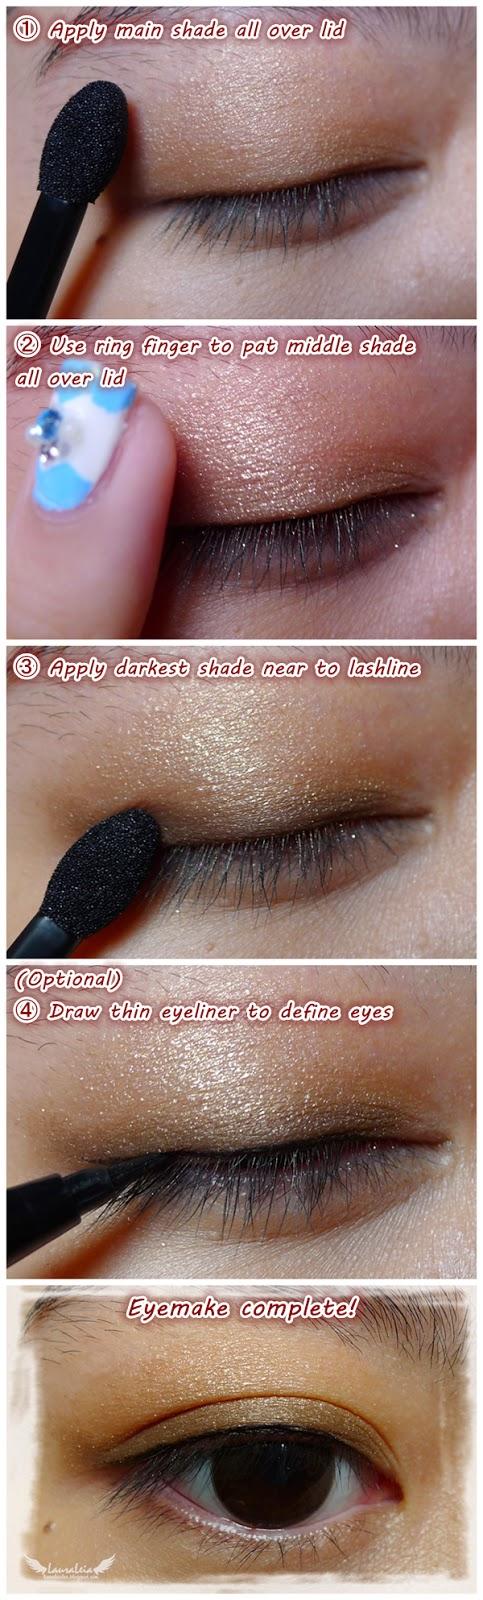 CANMAKE Juicy Pure Eyes Eyeshadow pictorial step-by-step